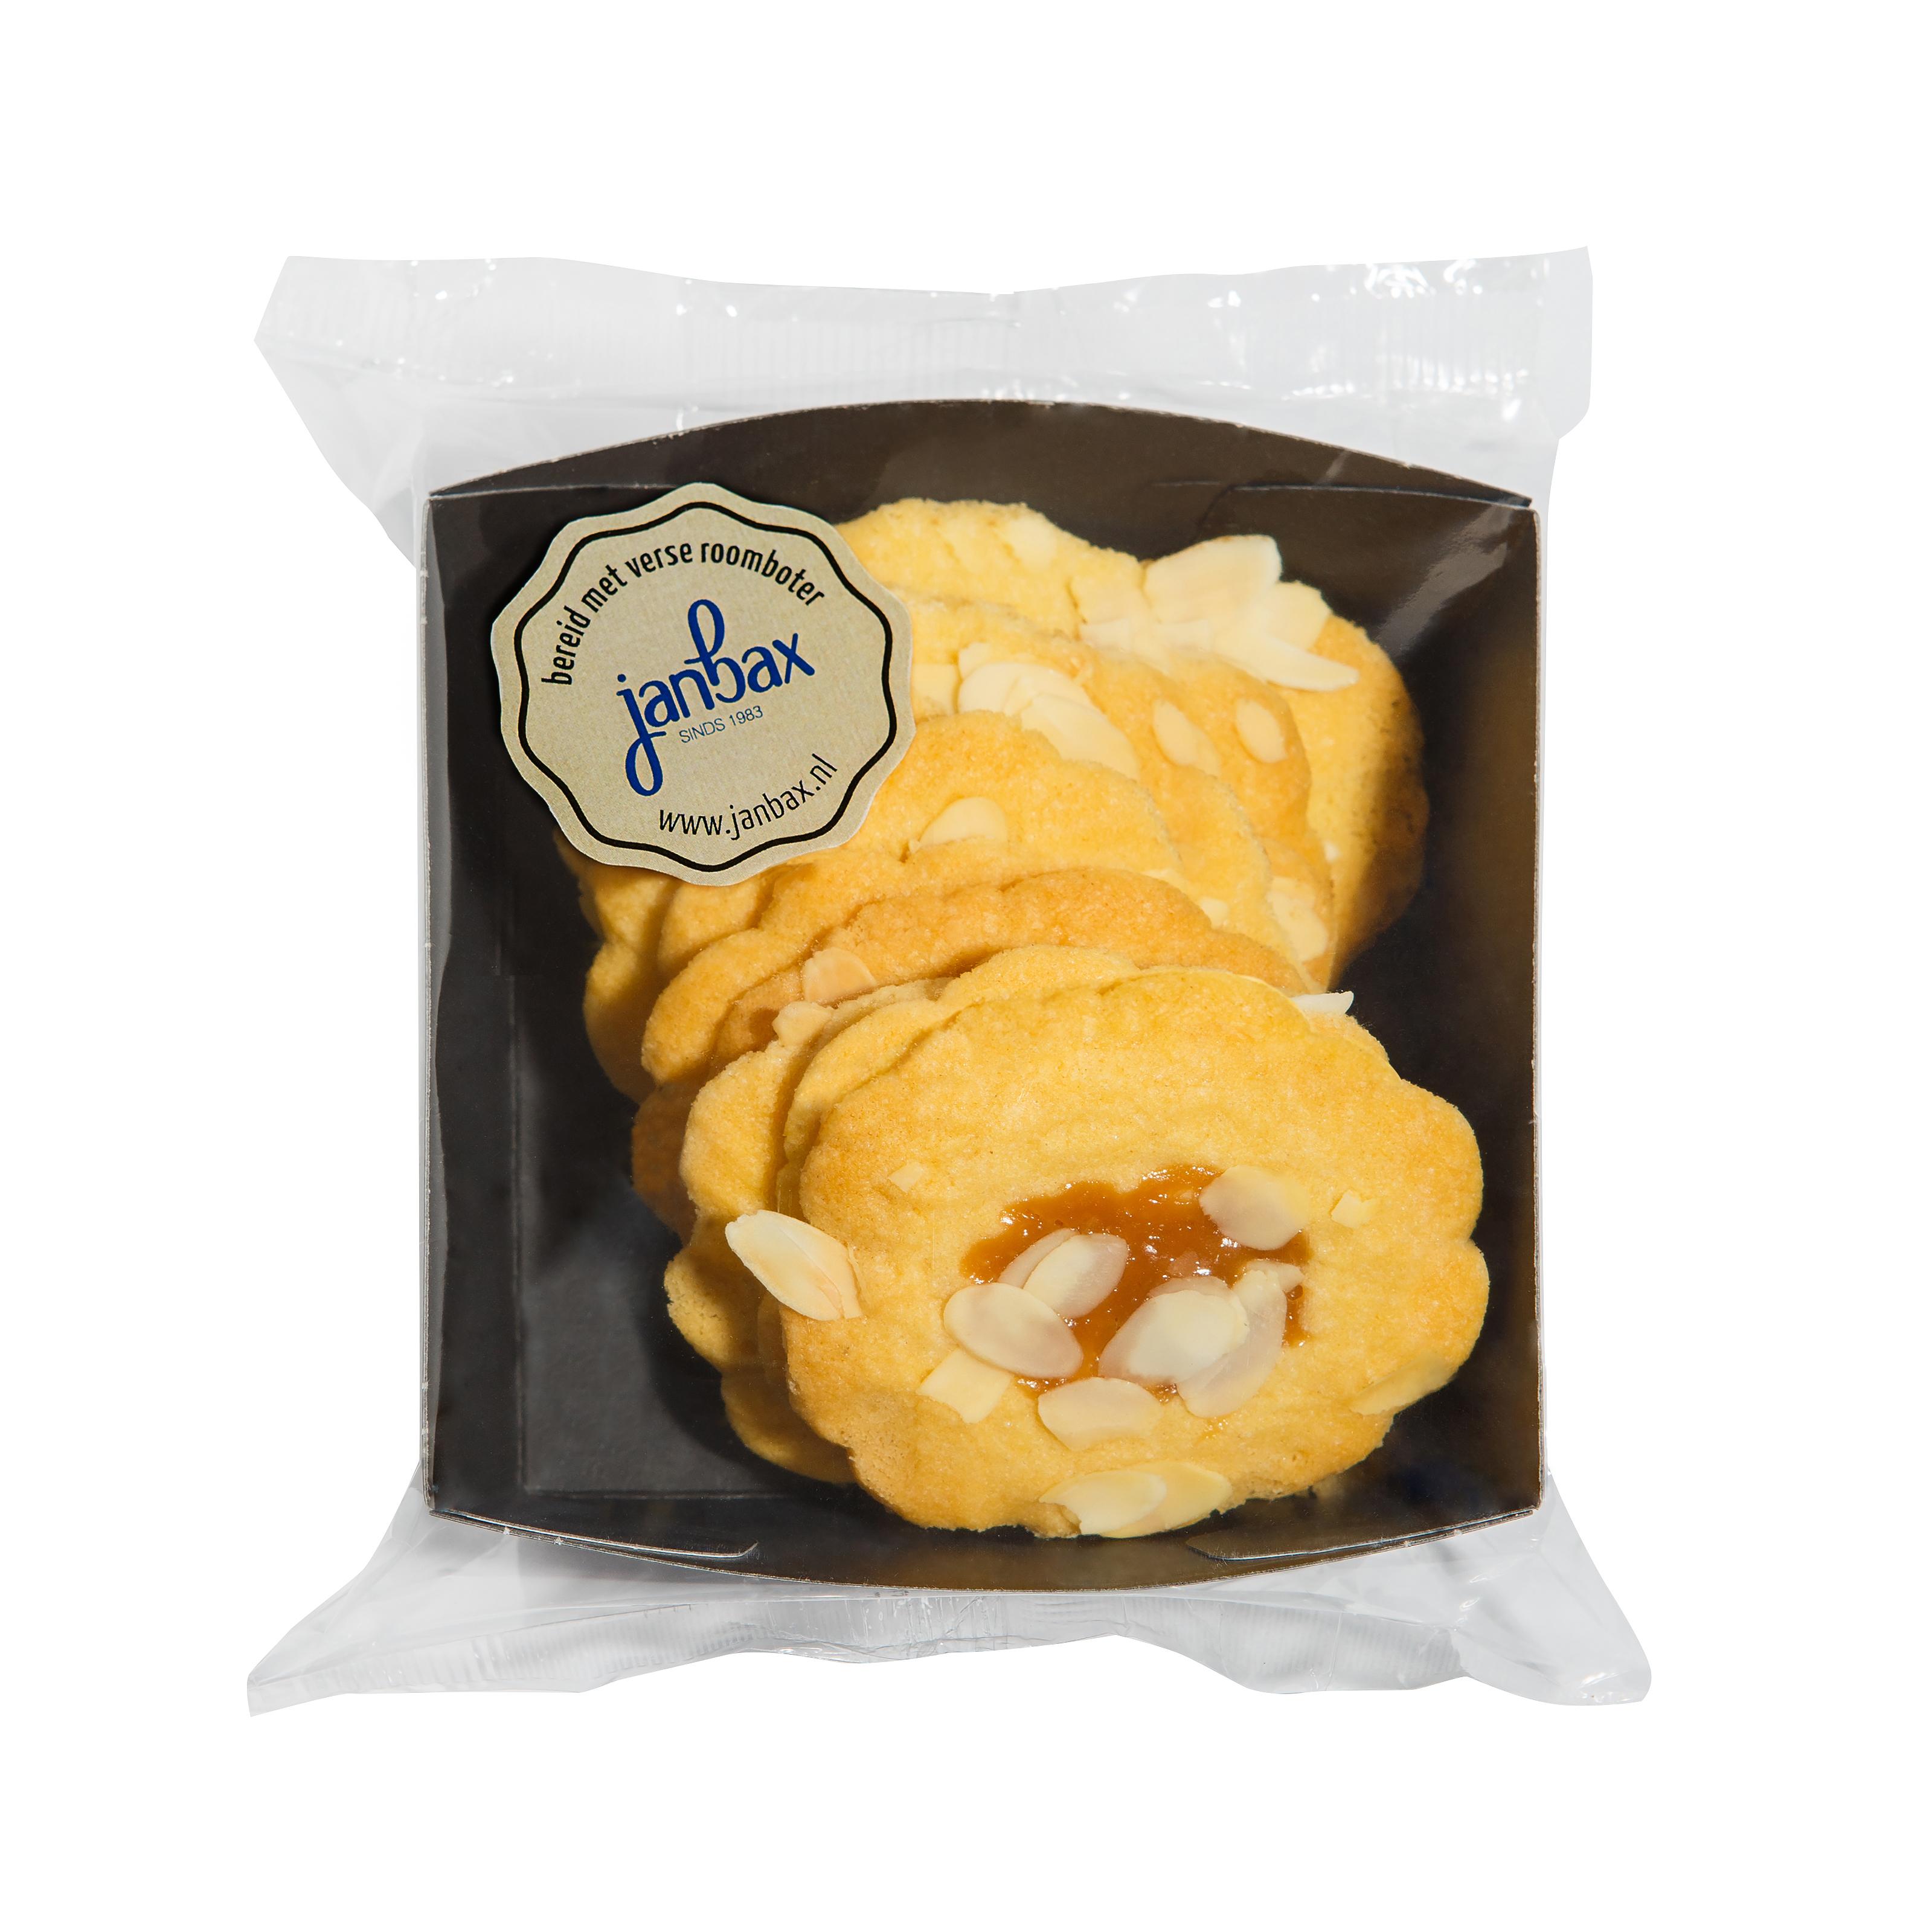 roomboterkoekjes carmello's [THT 4-6 mnd]